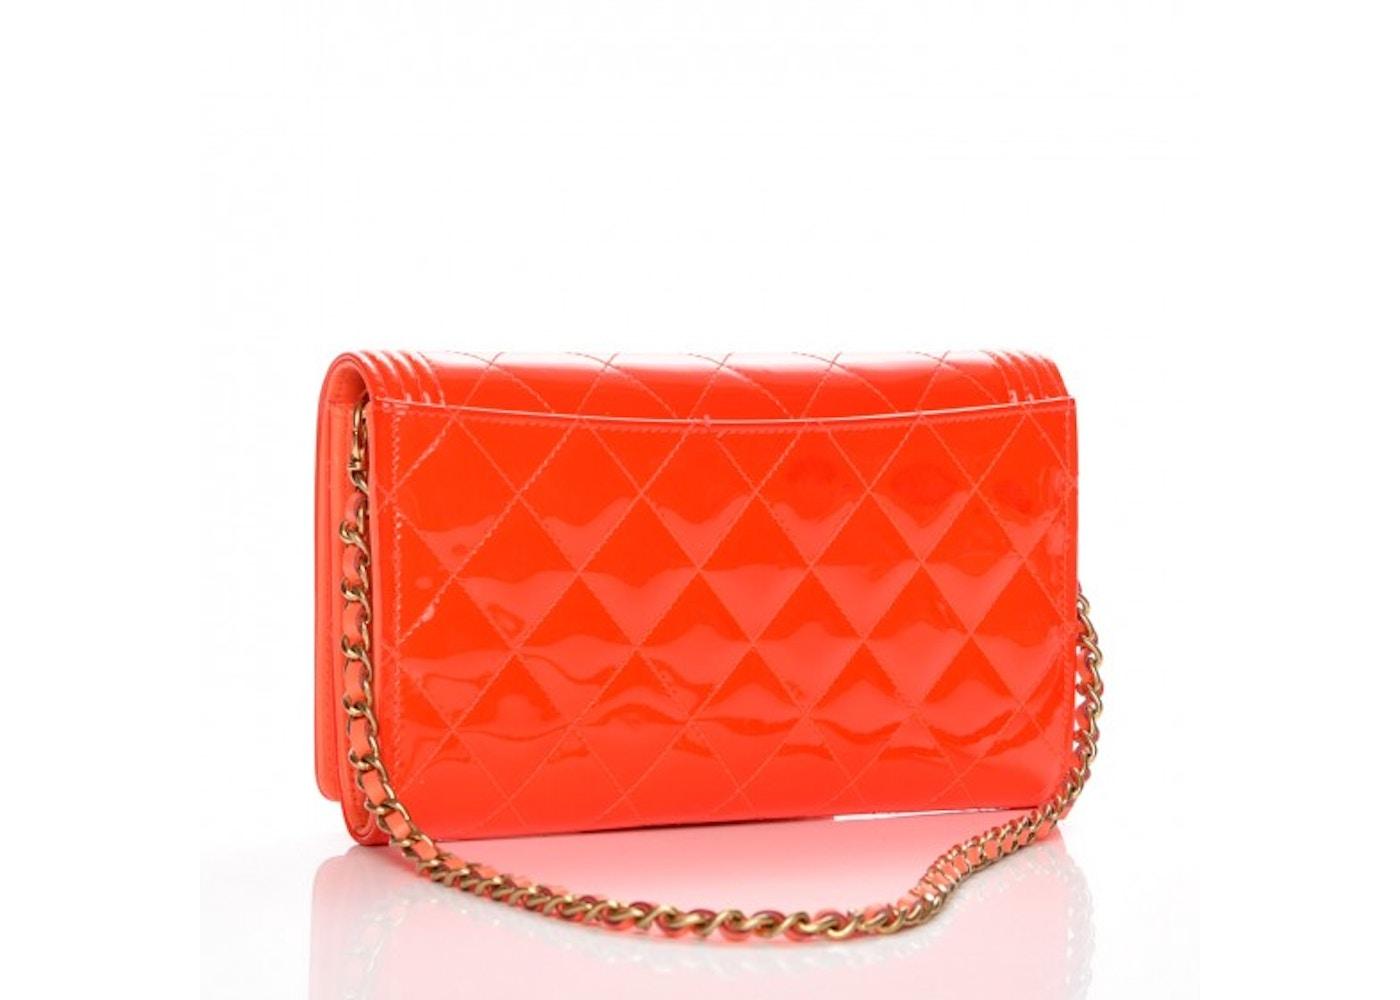 c98b99444125 Buy & Sell Chanel WOC Handbags